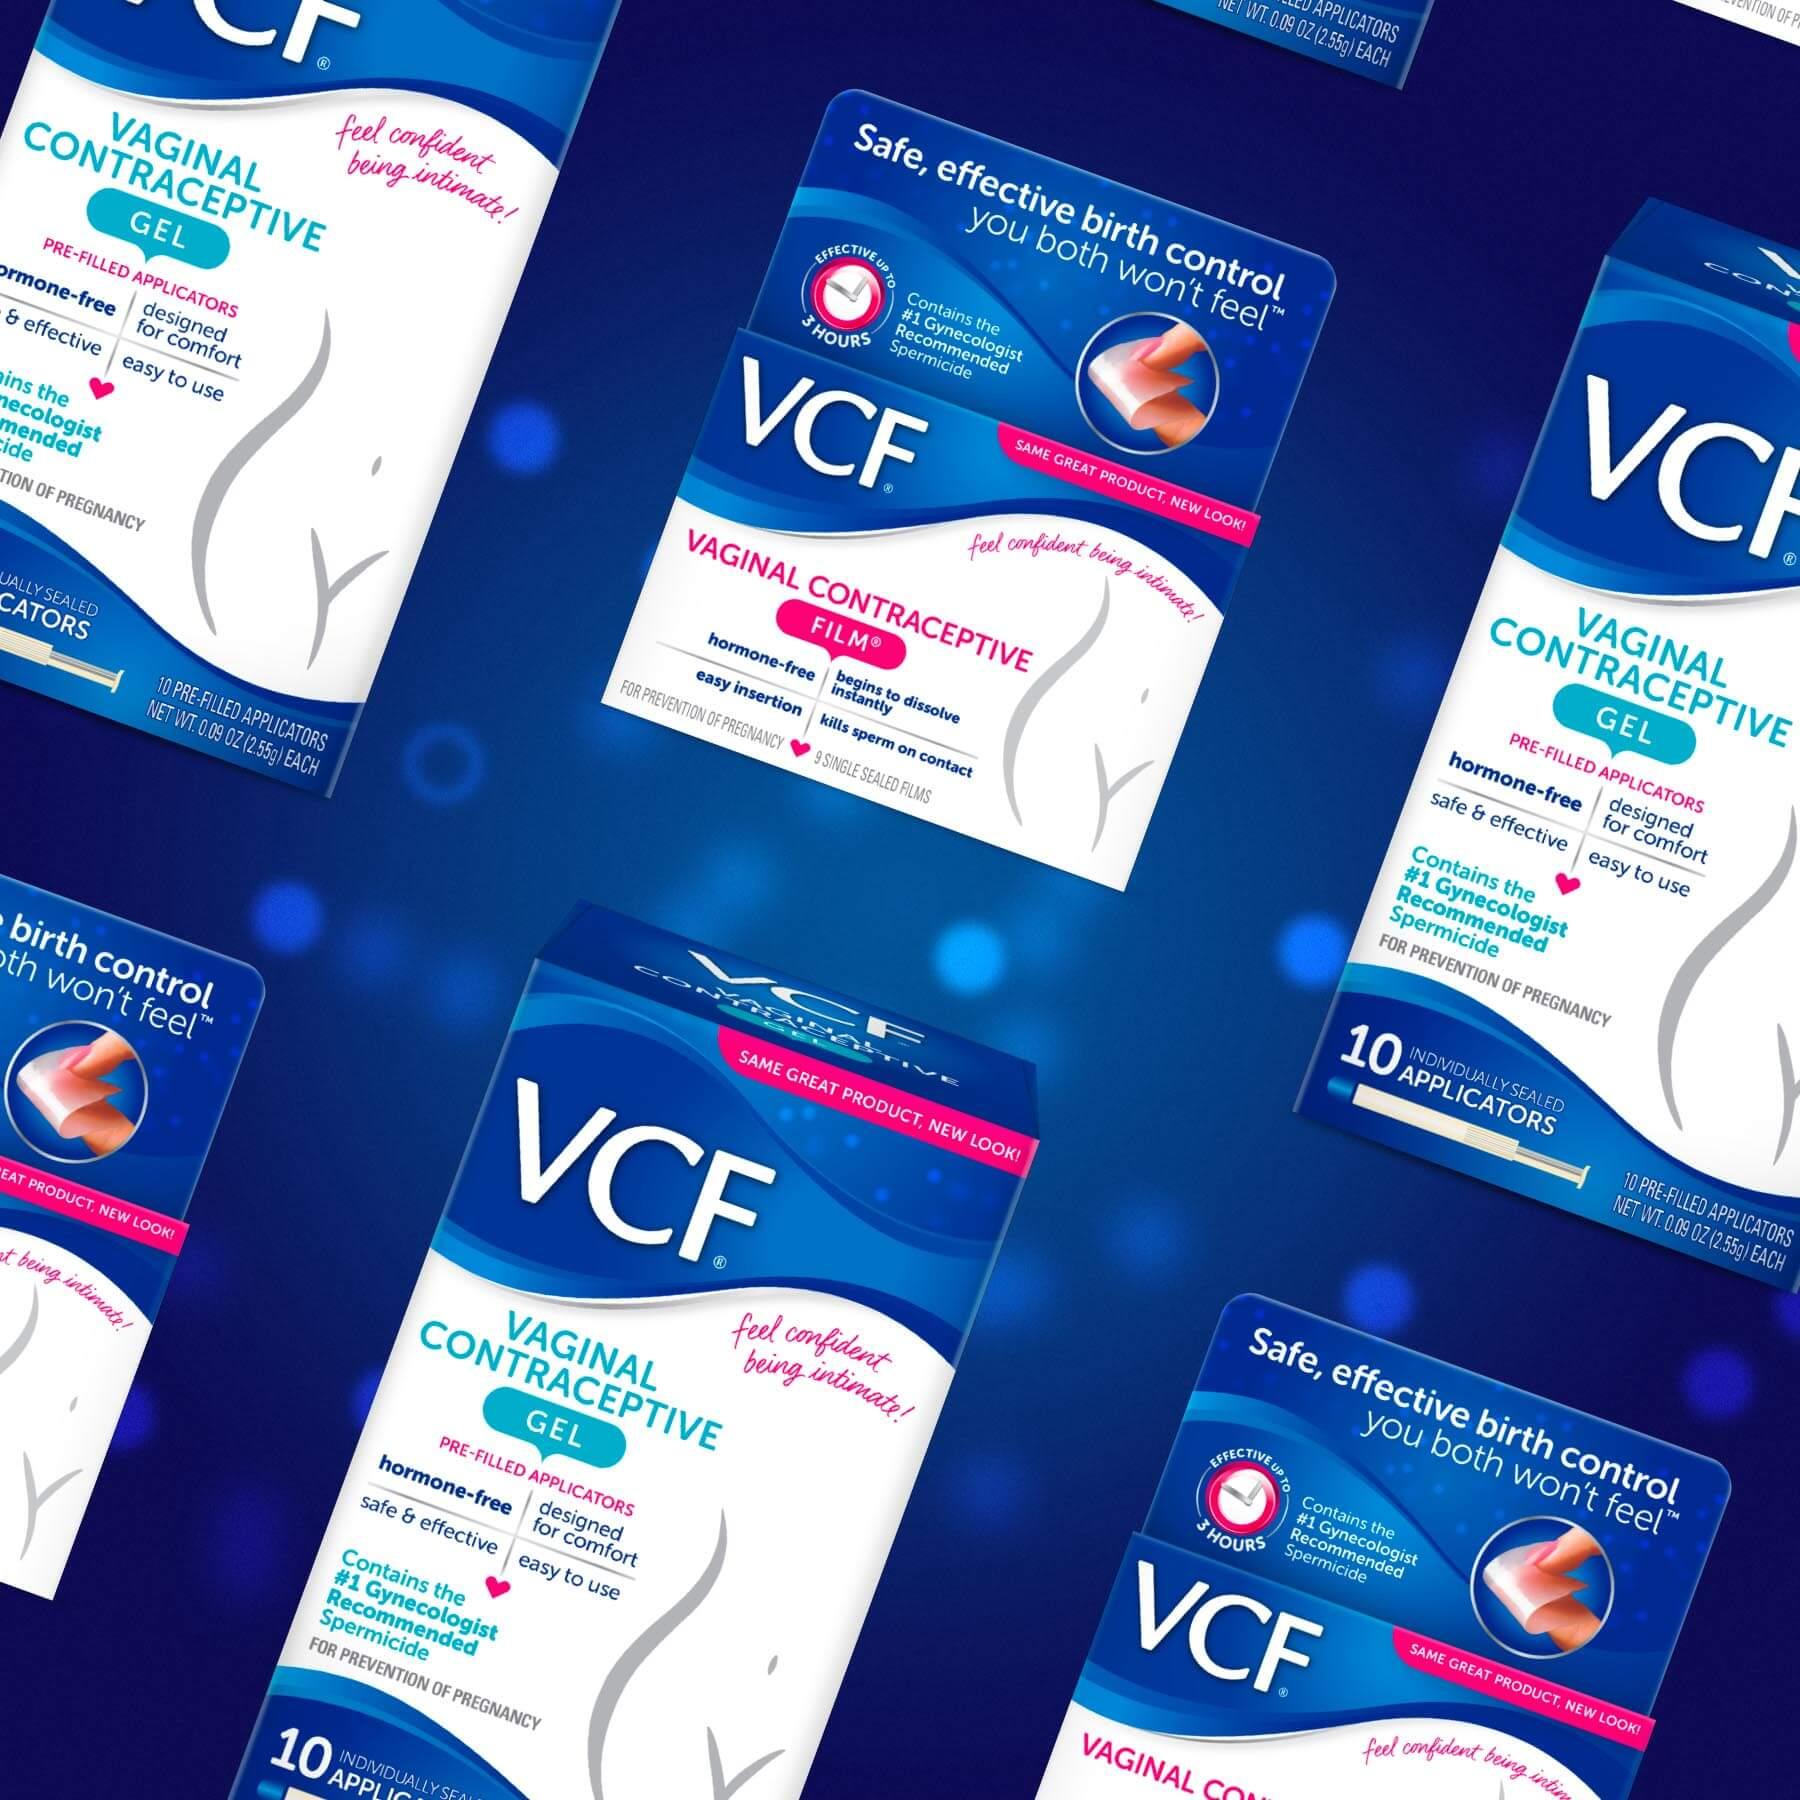 VCF Full Lineup